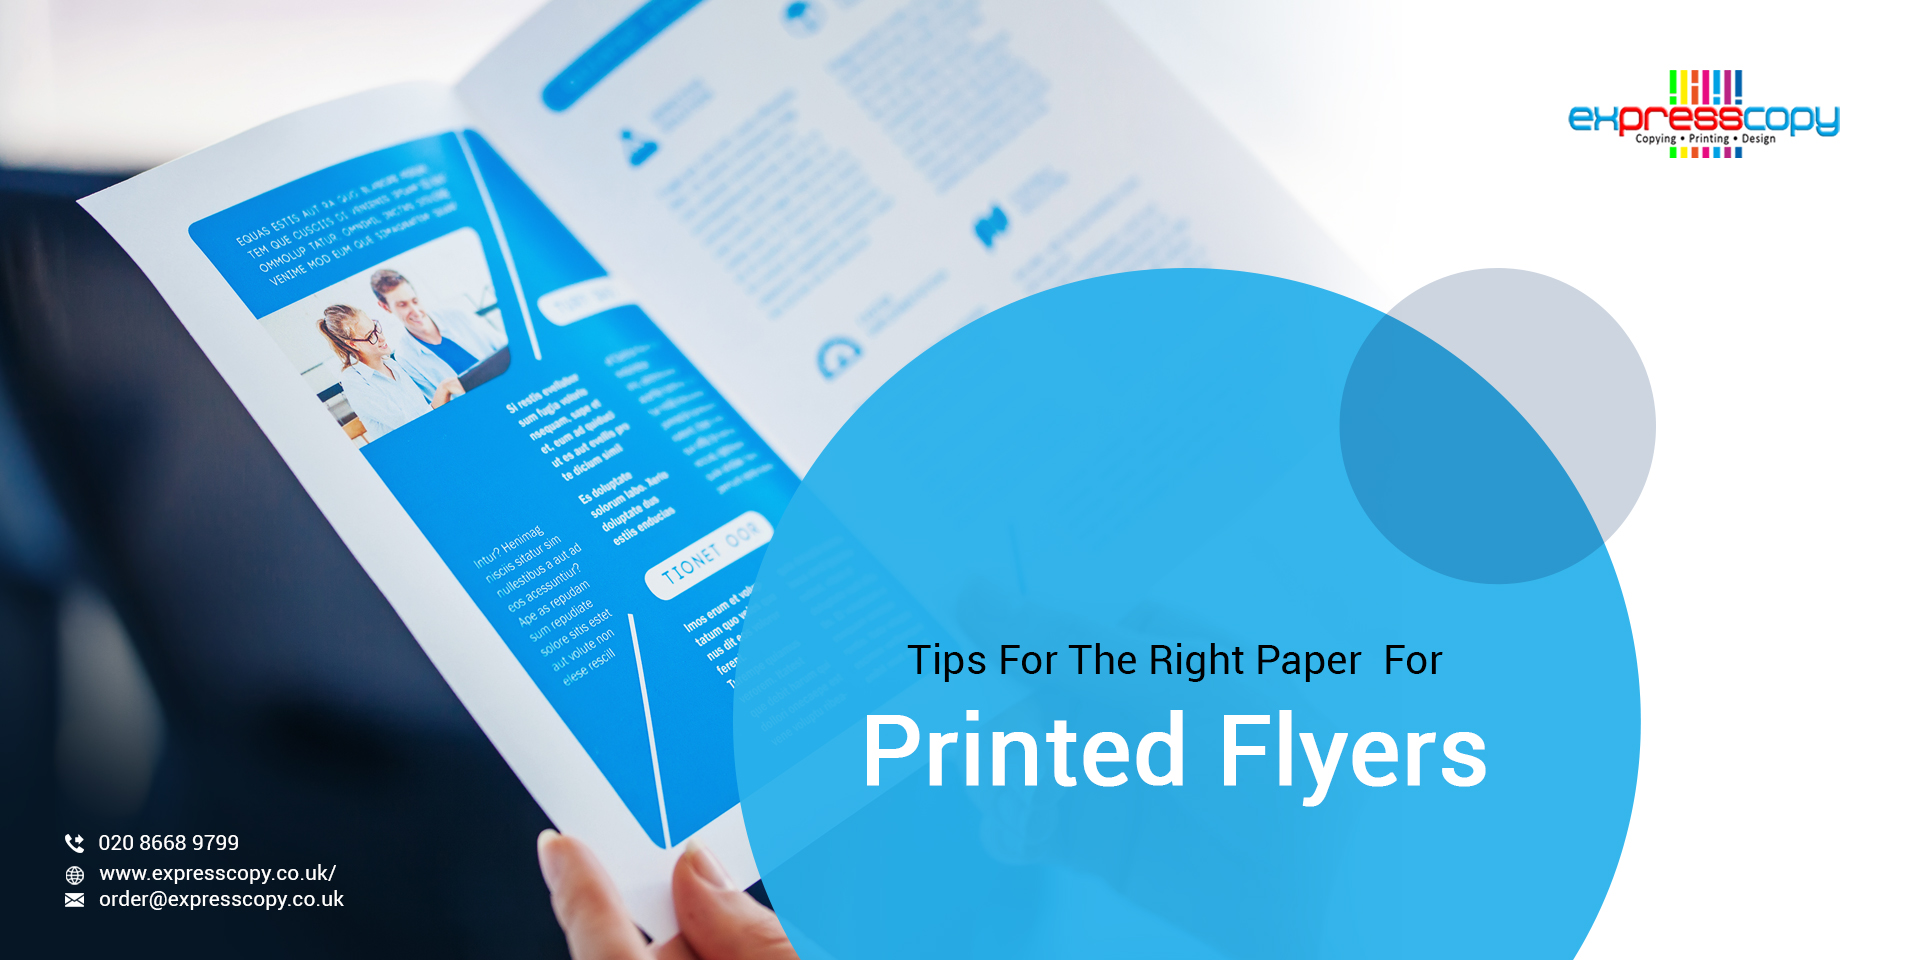 Printed Flyers